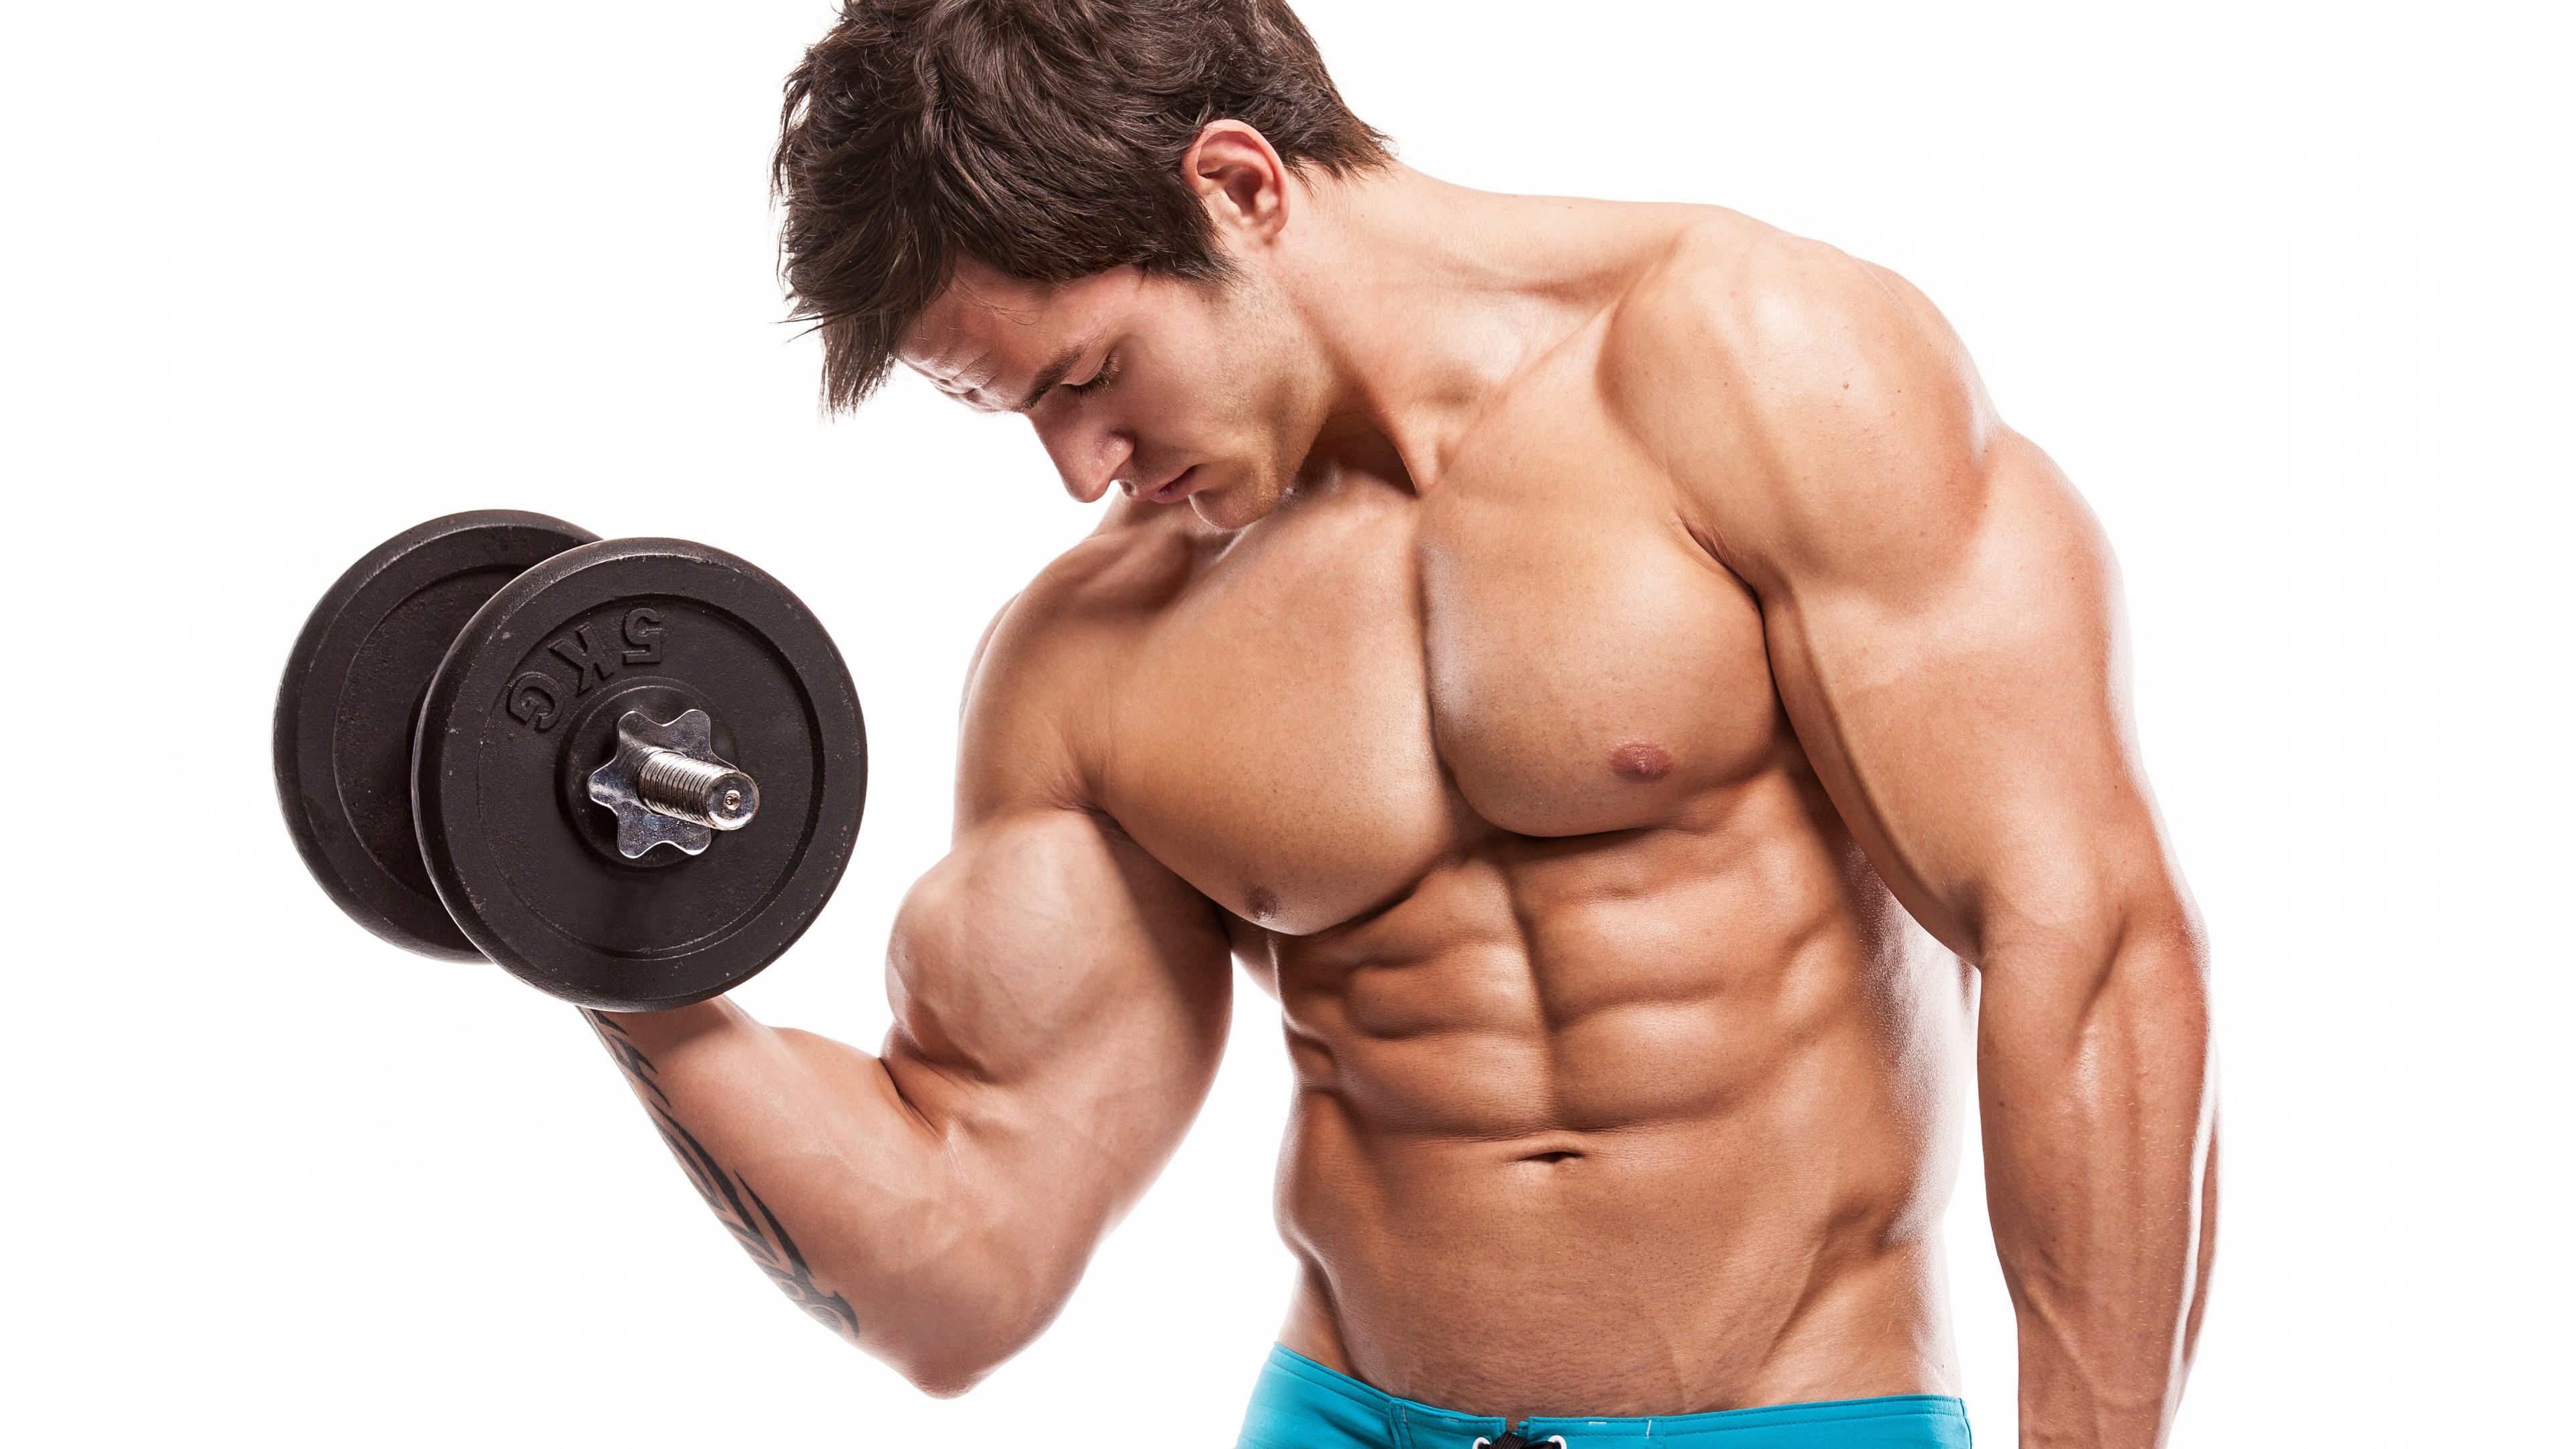 Wallpaper Man Stronger Body Bodybuilding Exercise Motivation Training Bench Standing Barbell Sport Wallpaper Download High Resolution 4k Wallpaper